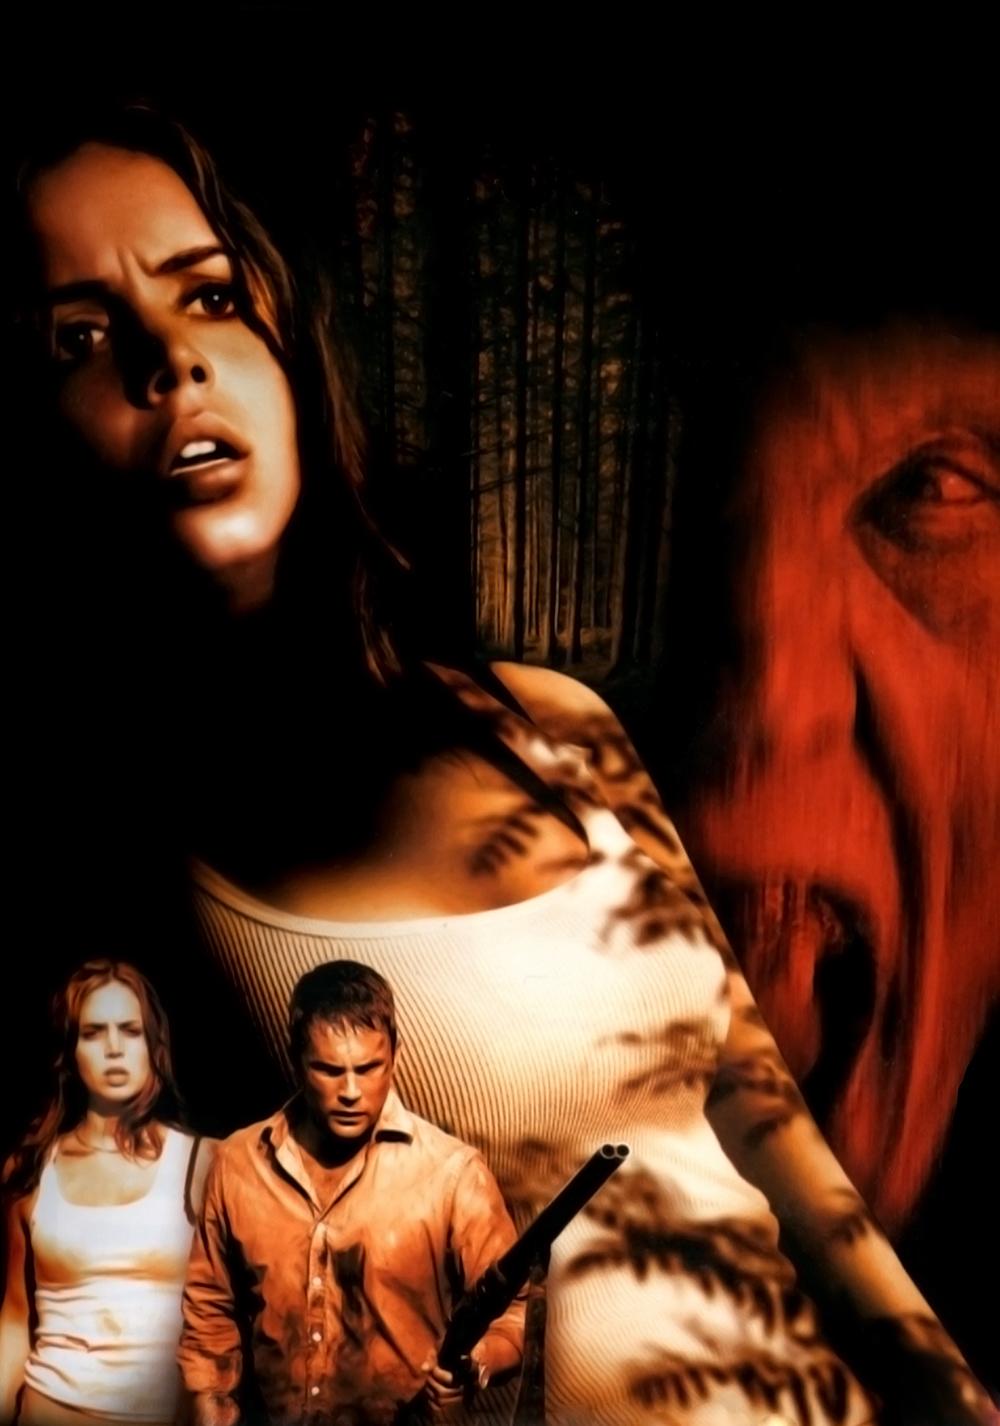 Ghostfuk horrormovies hindi naked video